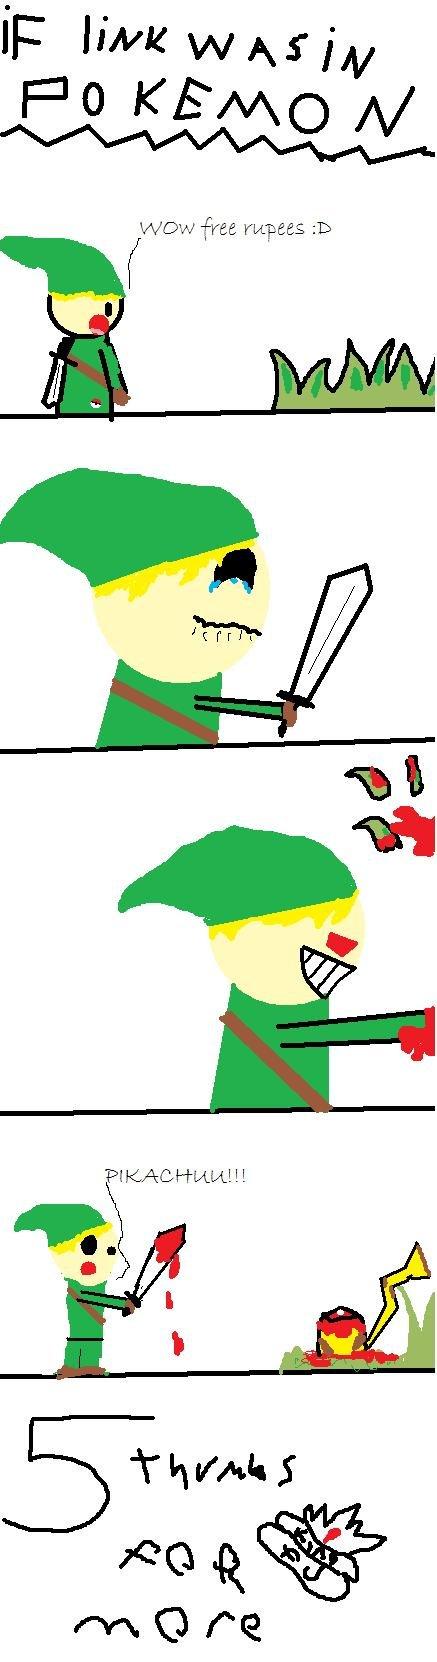 If Link was in pokemon?. If link was in pokemon?.. M-make moar! ^_^